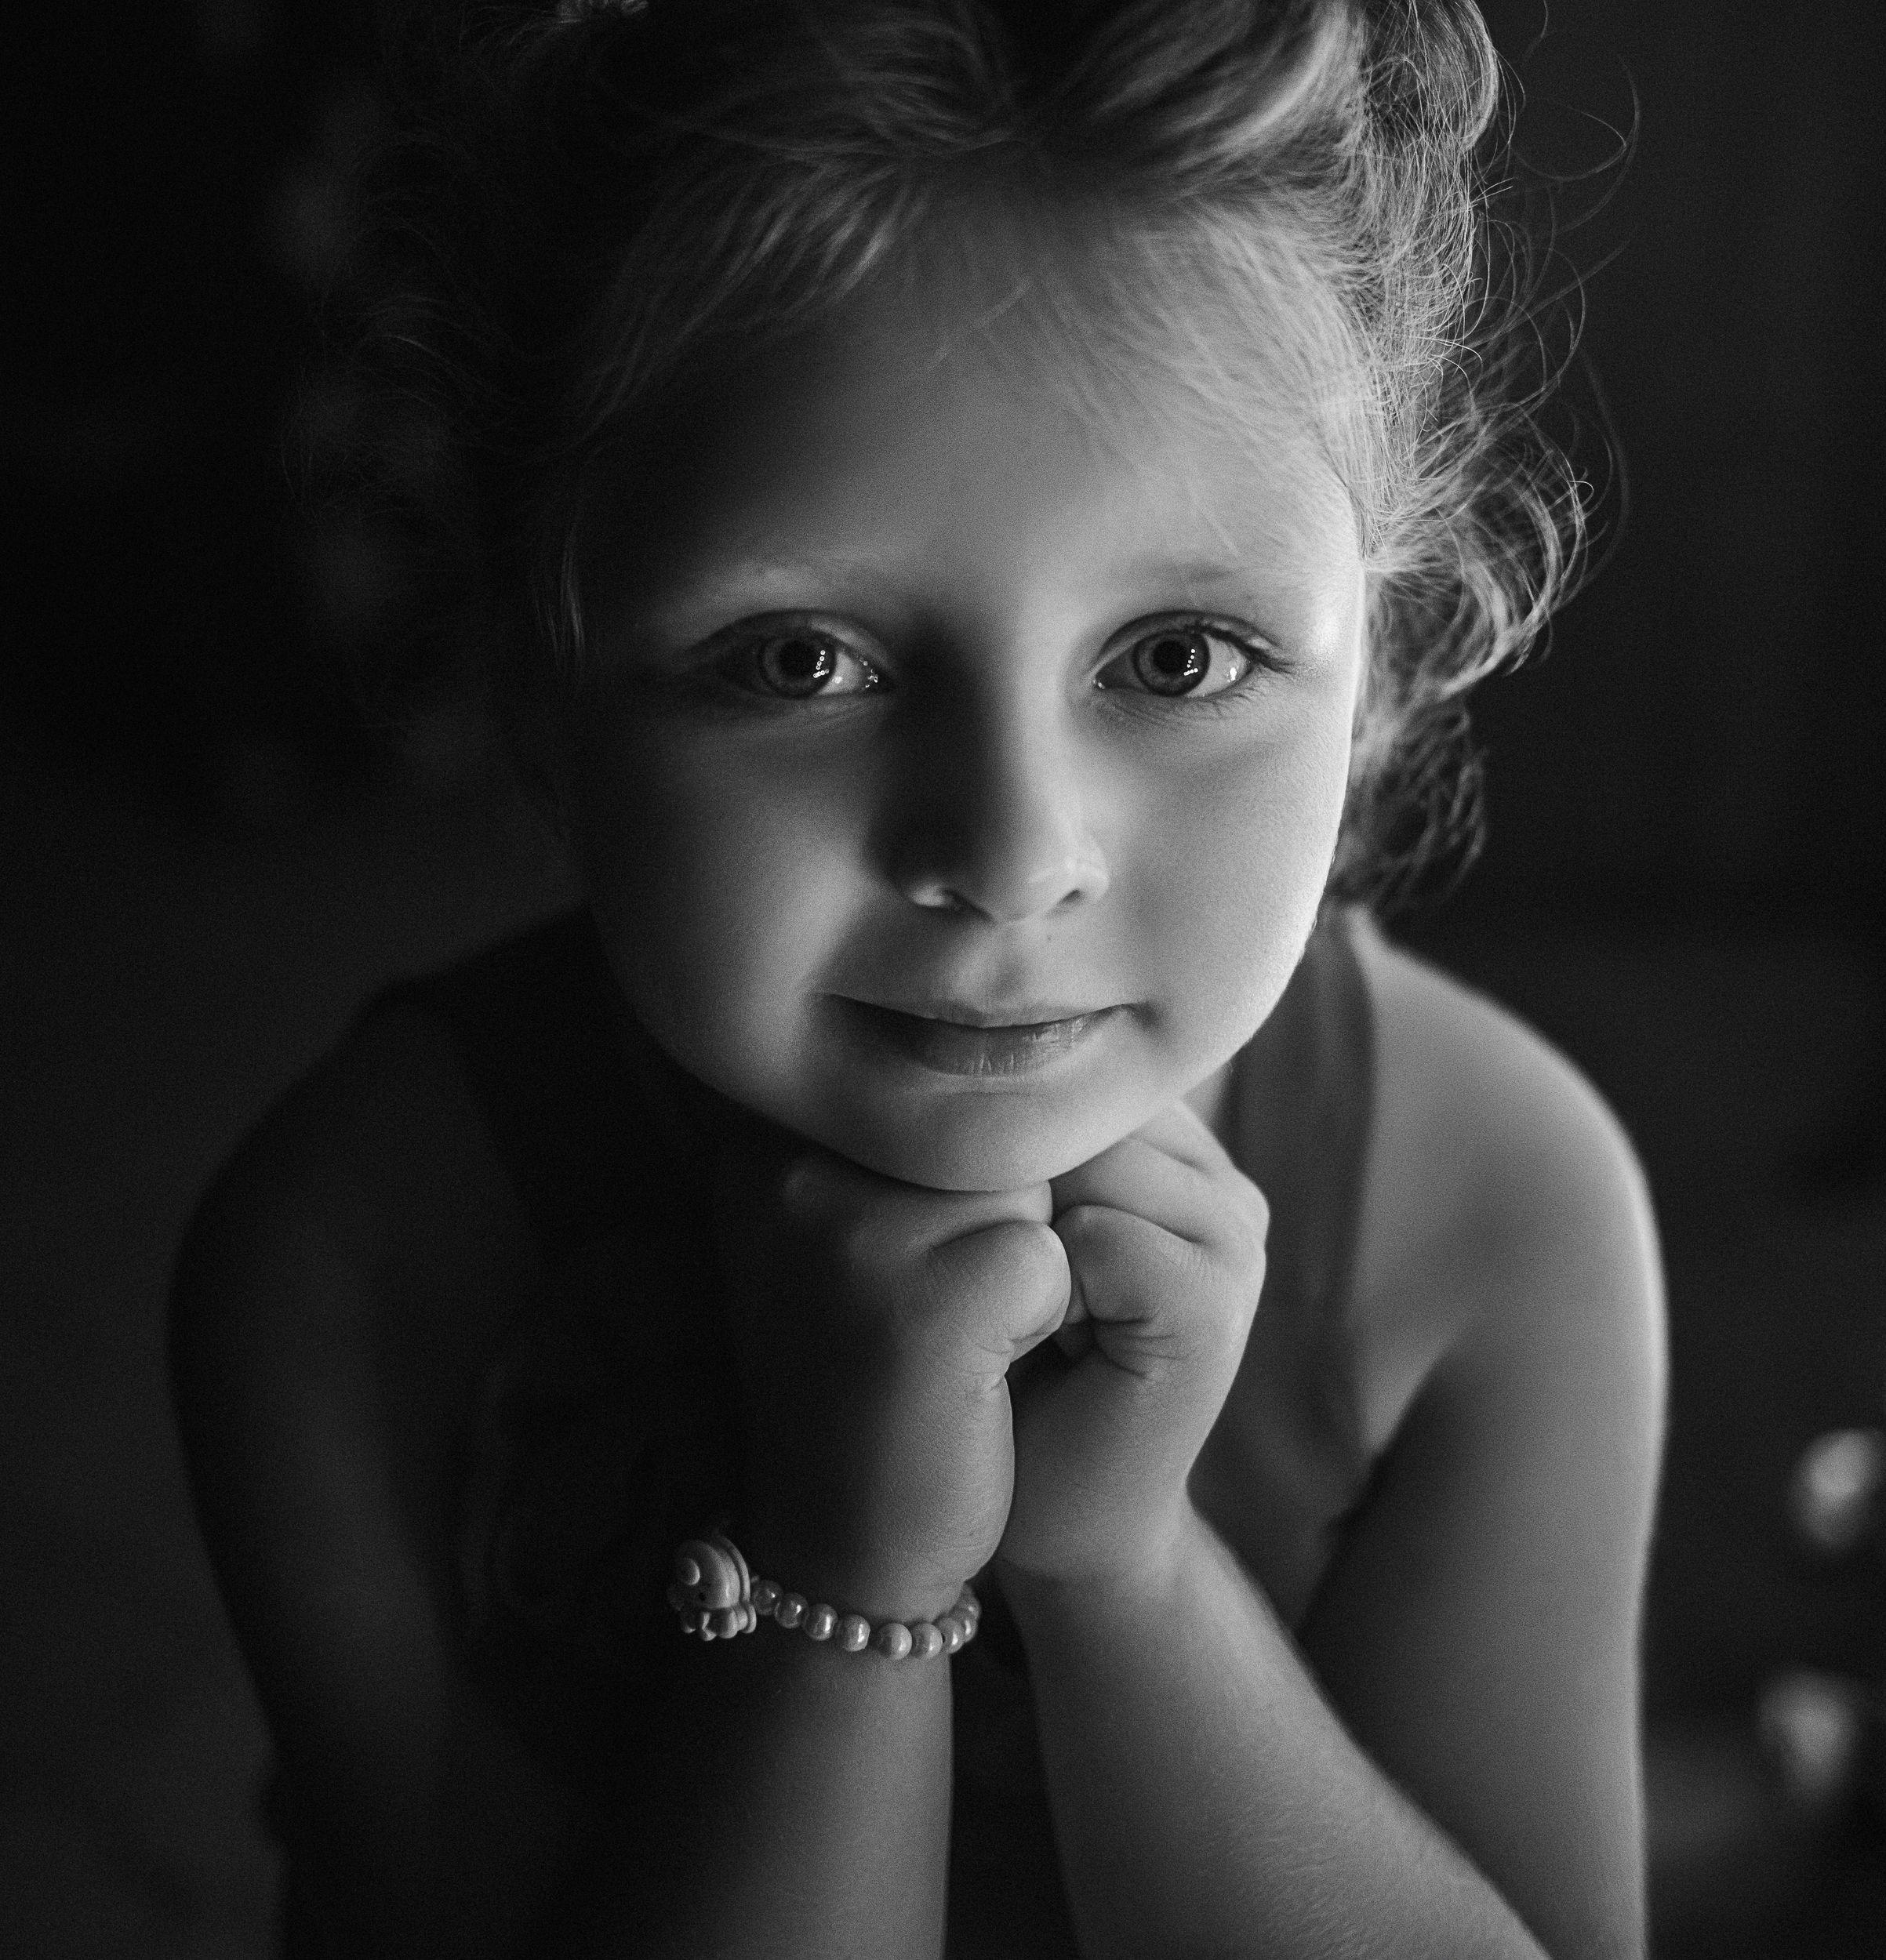 девочка, портрет, фотосессия, girl, young, portrait, творческий портрет, детский портрет, young girl, дети, children, детская фотография, детская фотосессия, постановка, постановочная фотография, чб, чёрно-белое фото, bw, black and white, Васильев Владимир